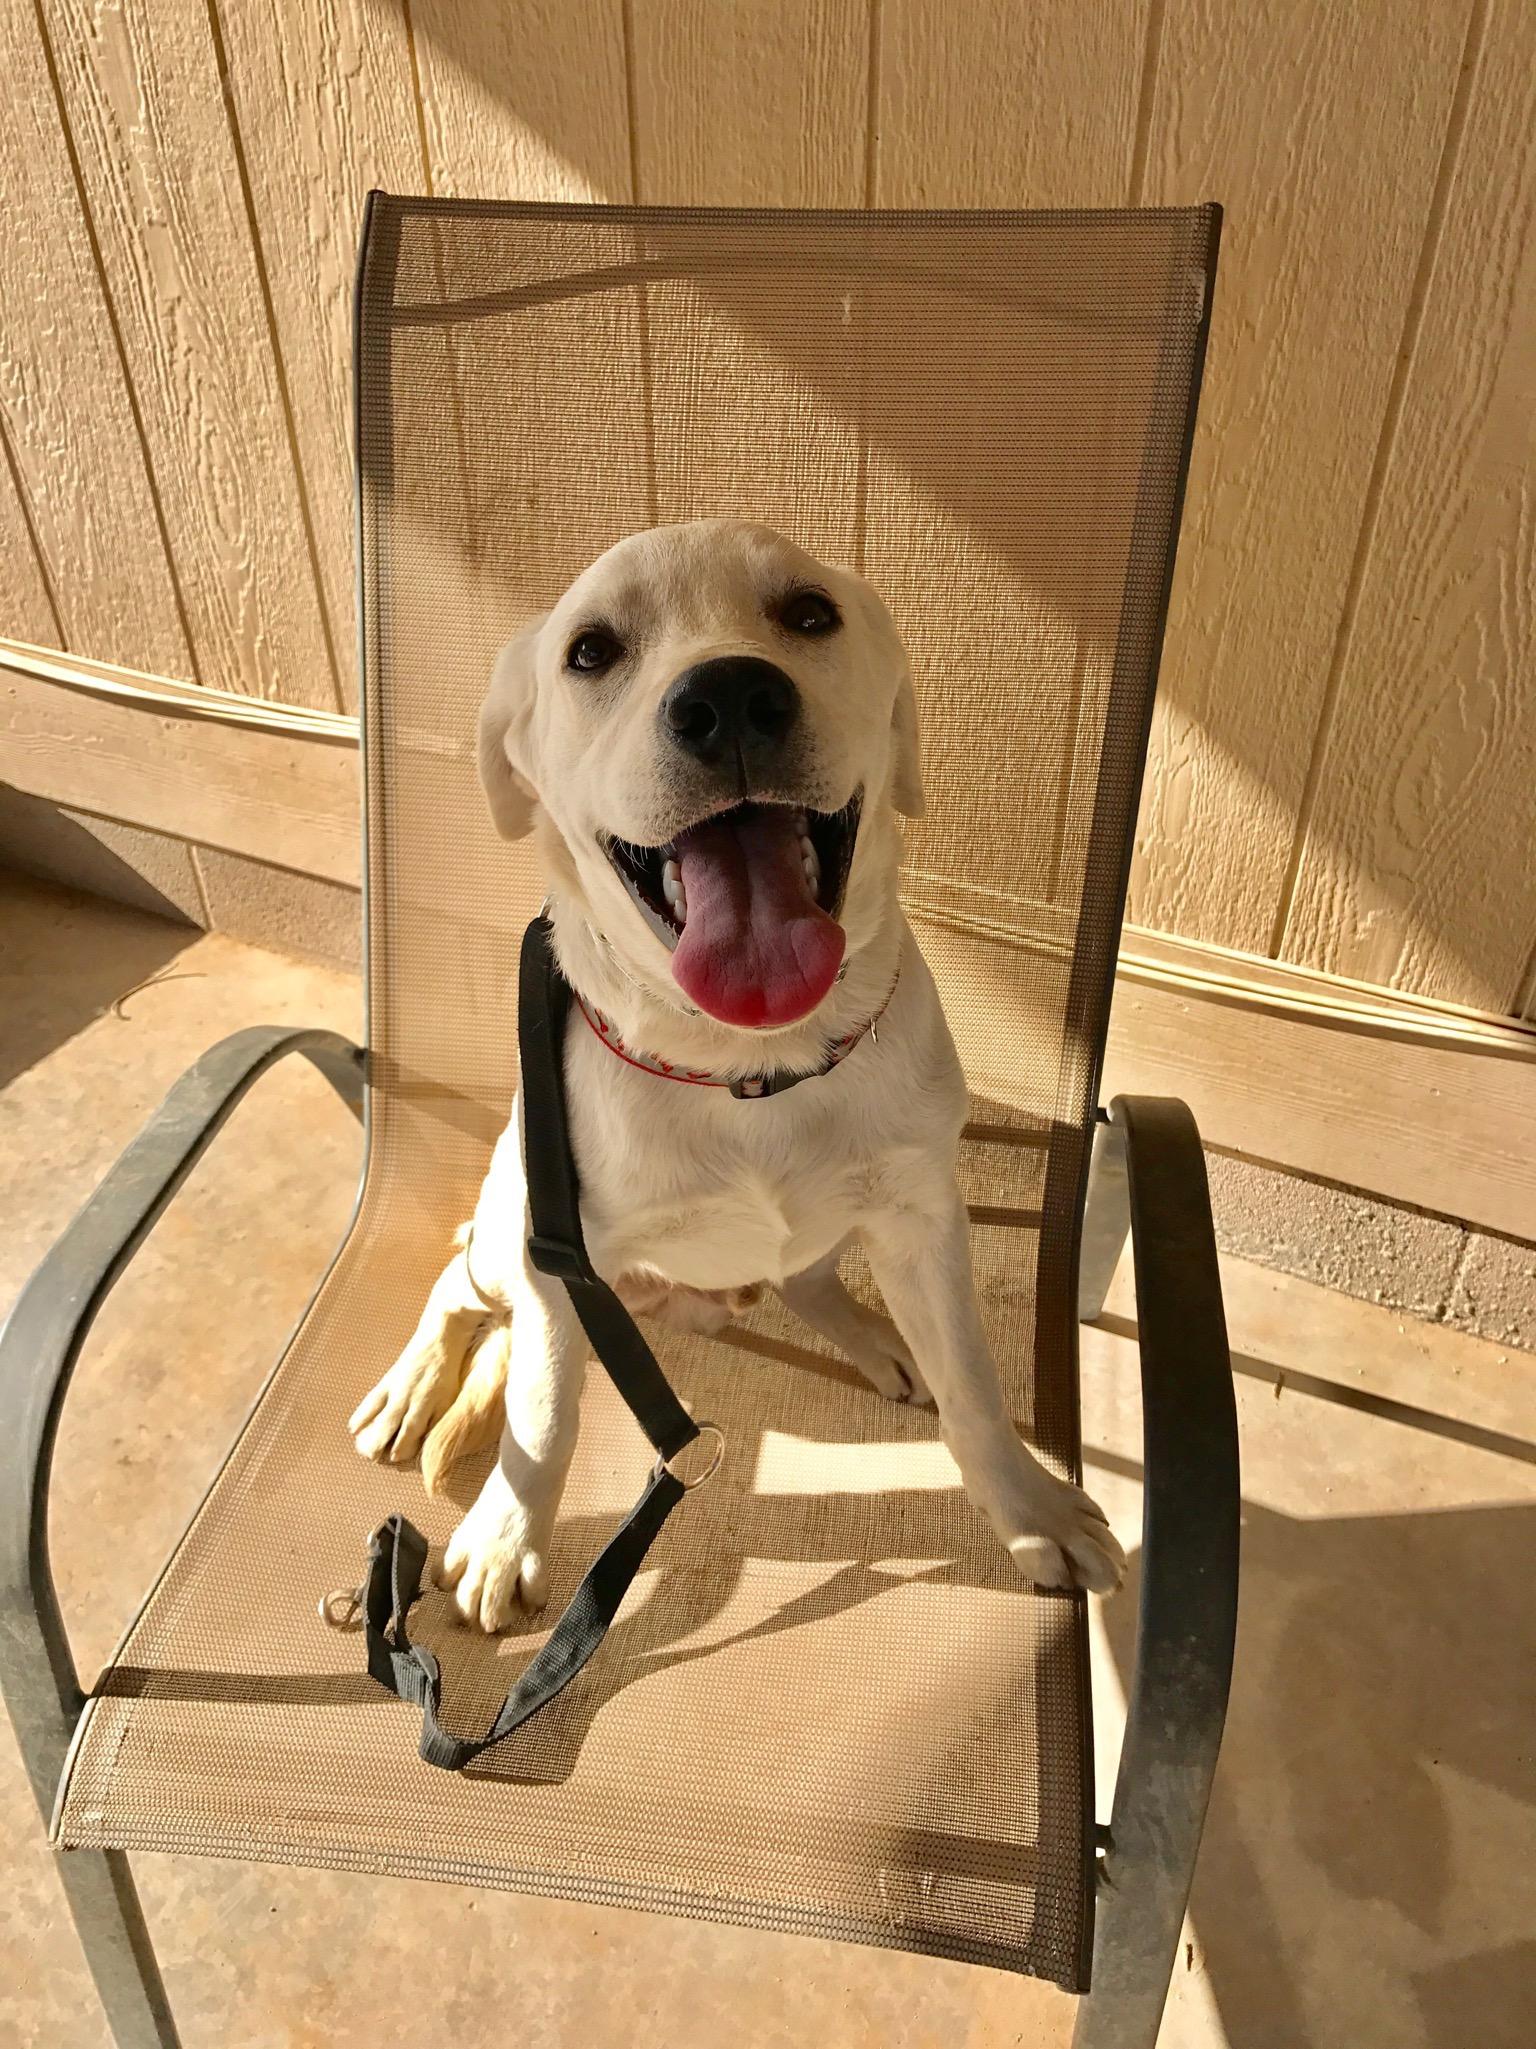 Diabetic Alert Dog in Training: Sit Stay